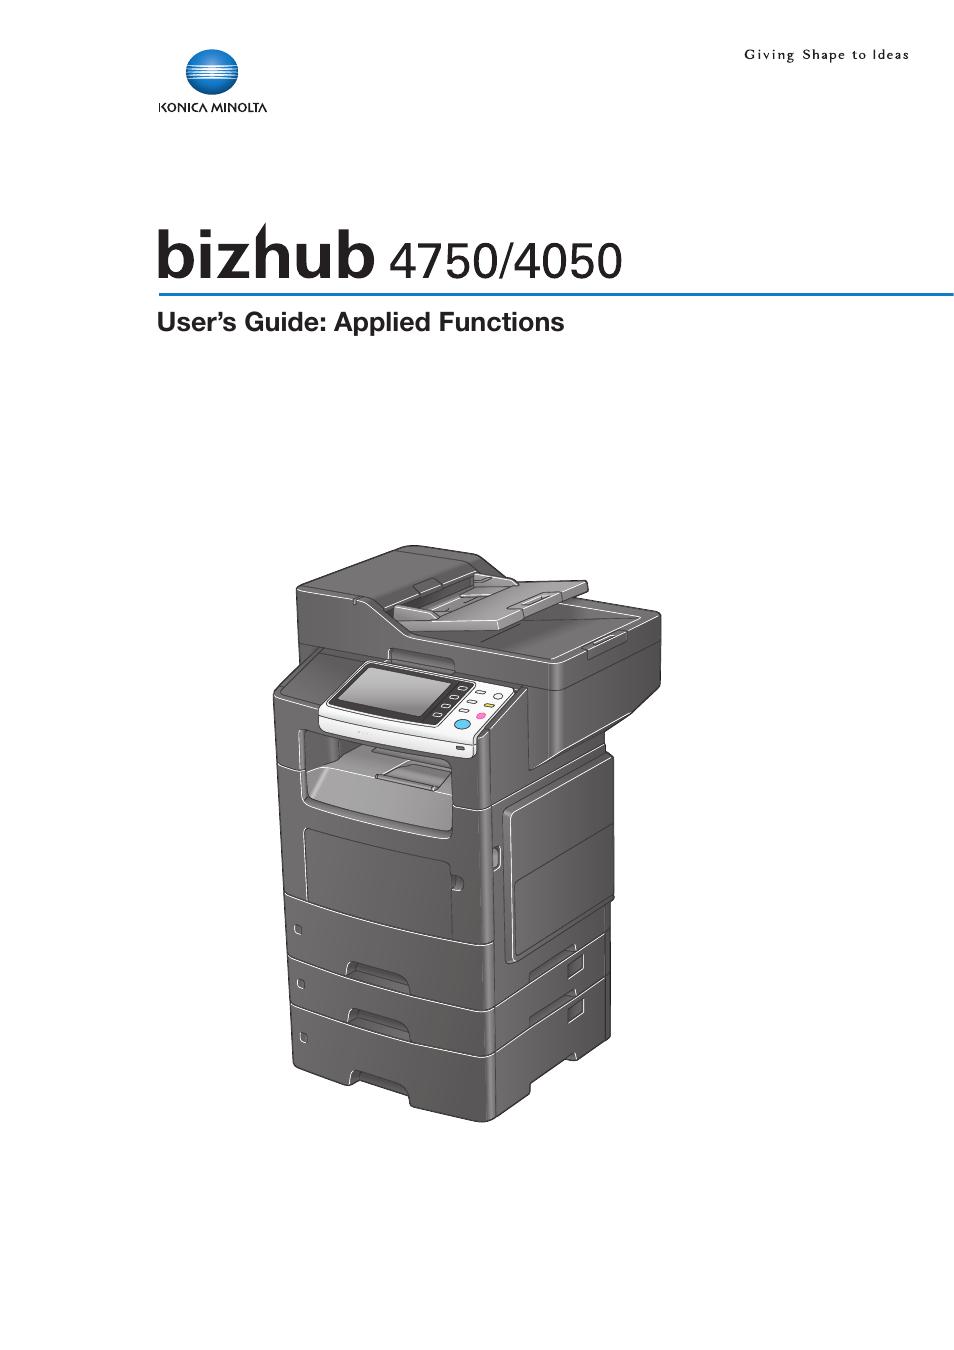 Konica Minolta bizhub 4750 User Manual   149 pages   Also for: bizhub 4050